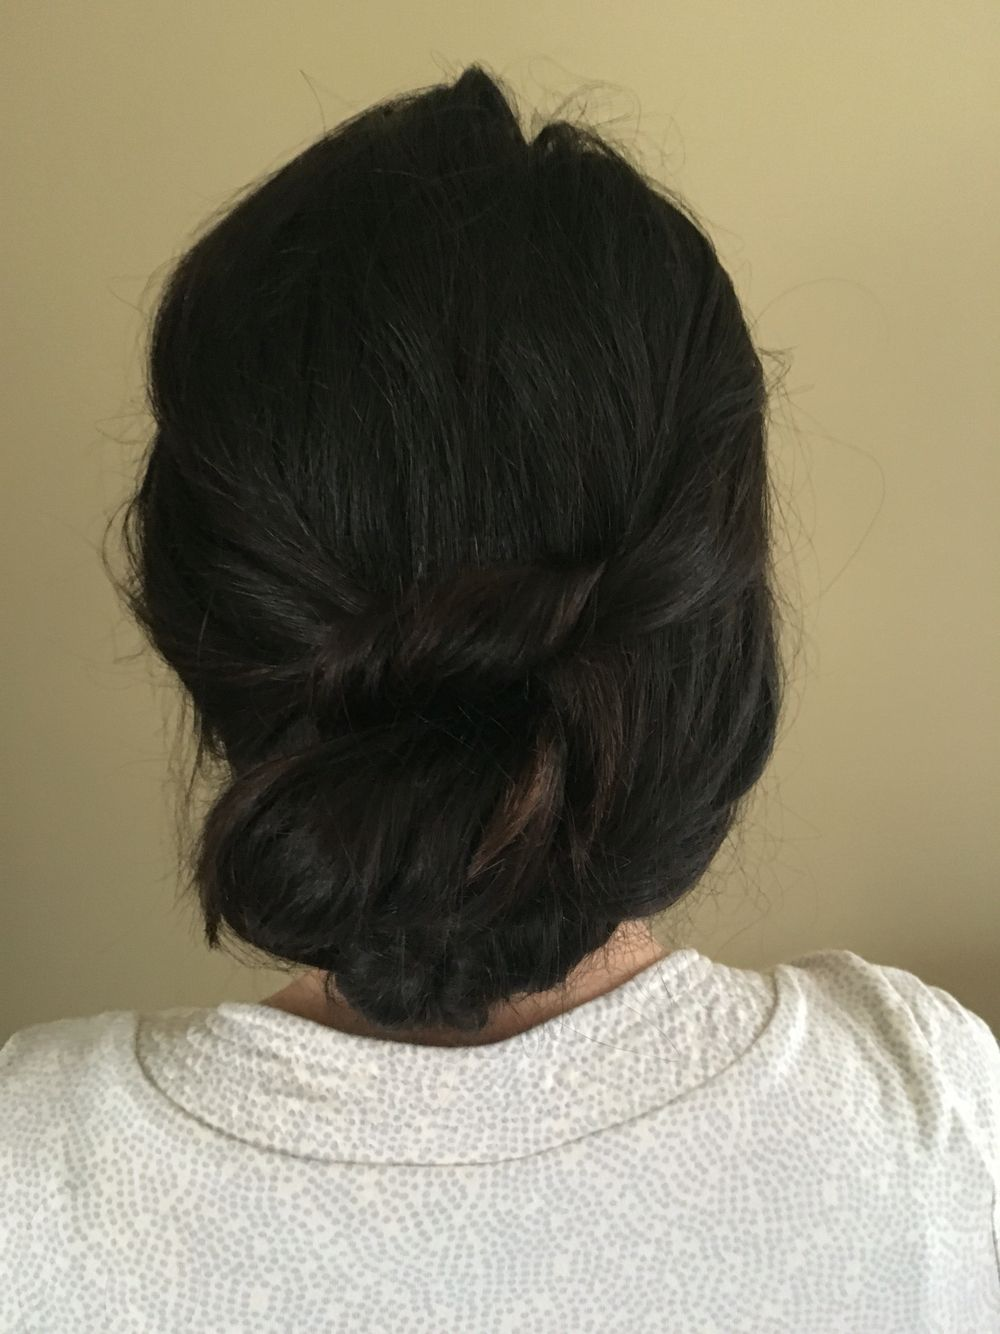 Bohemian Knot Updo Hairstyle Salonoggi Clawson Michigan Www